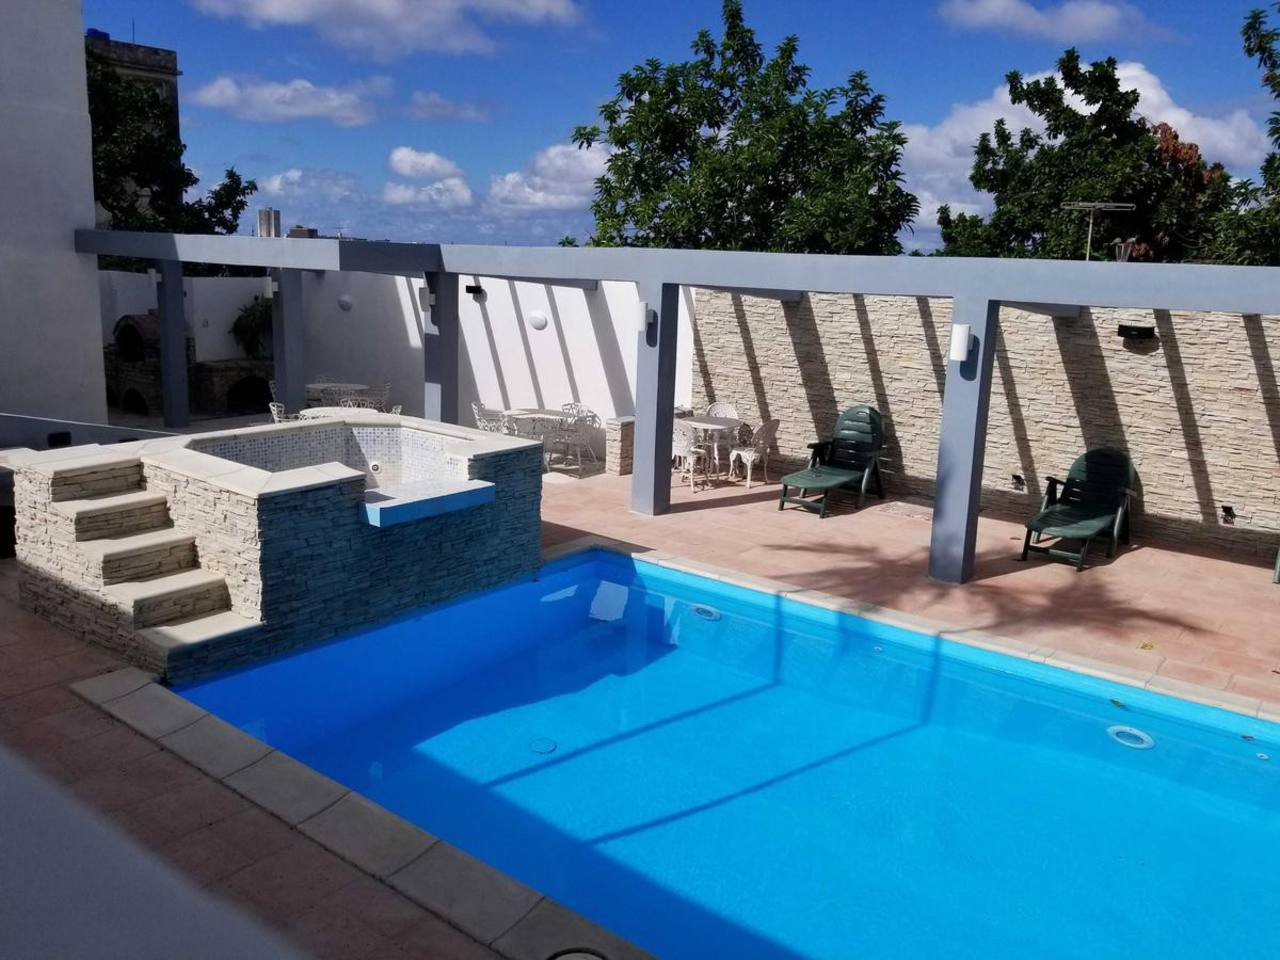 Villa Don Teto Suite & 8 Rooms: Great Havana View photo 26030621